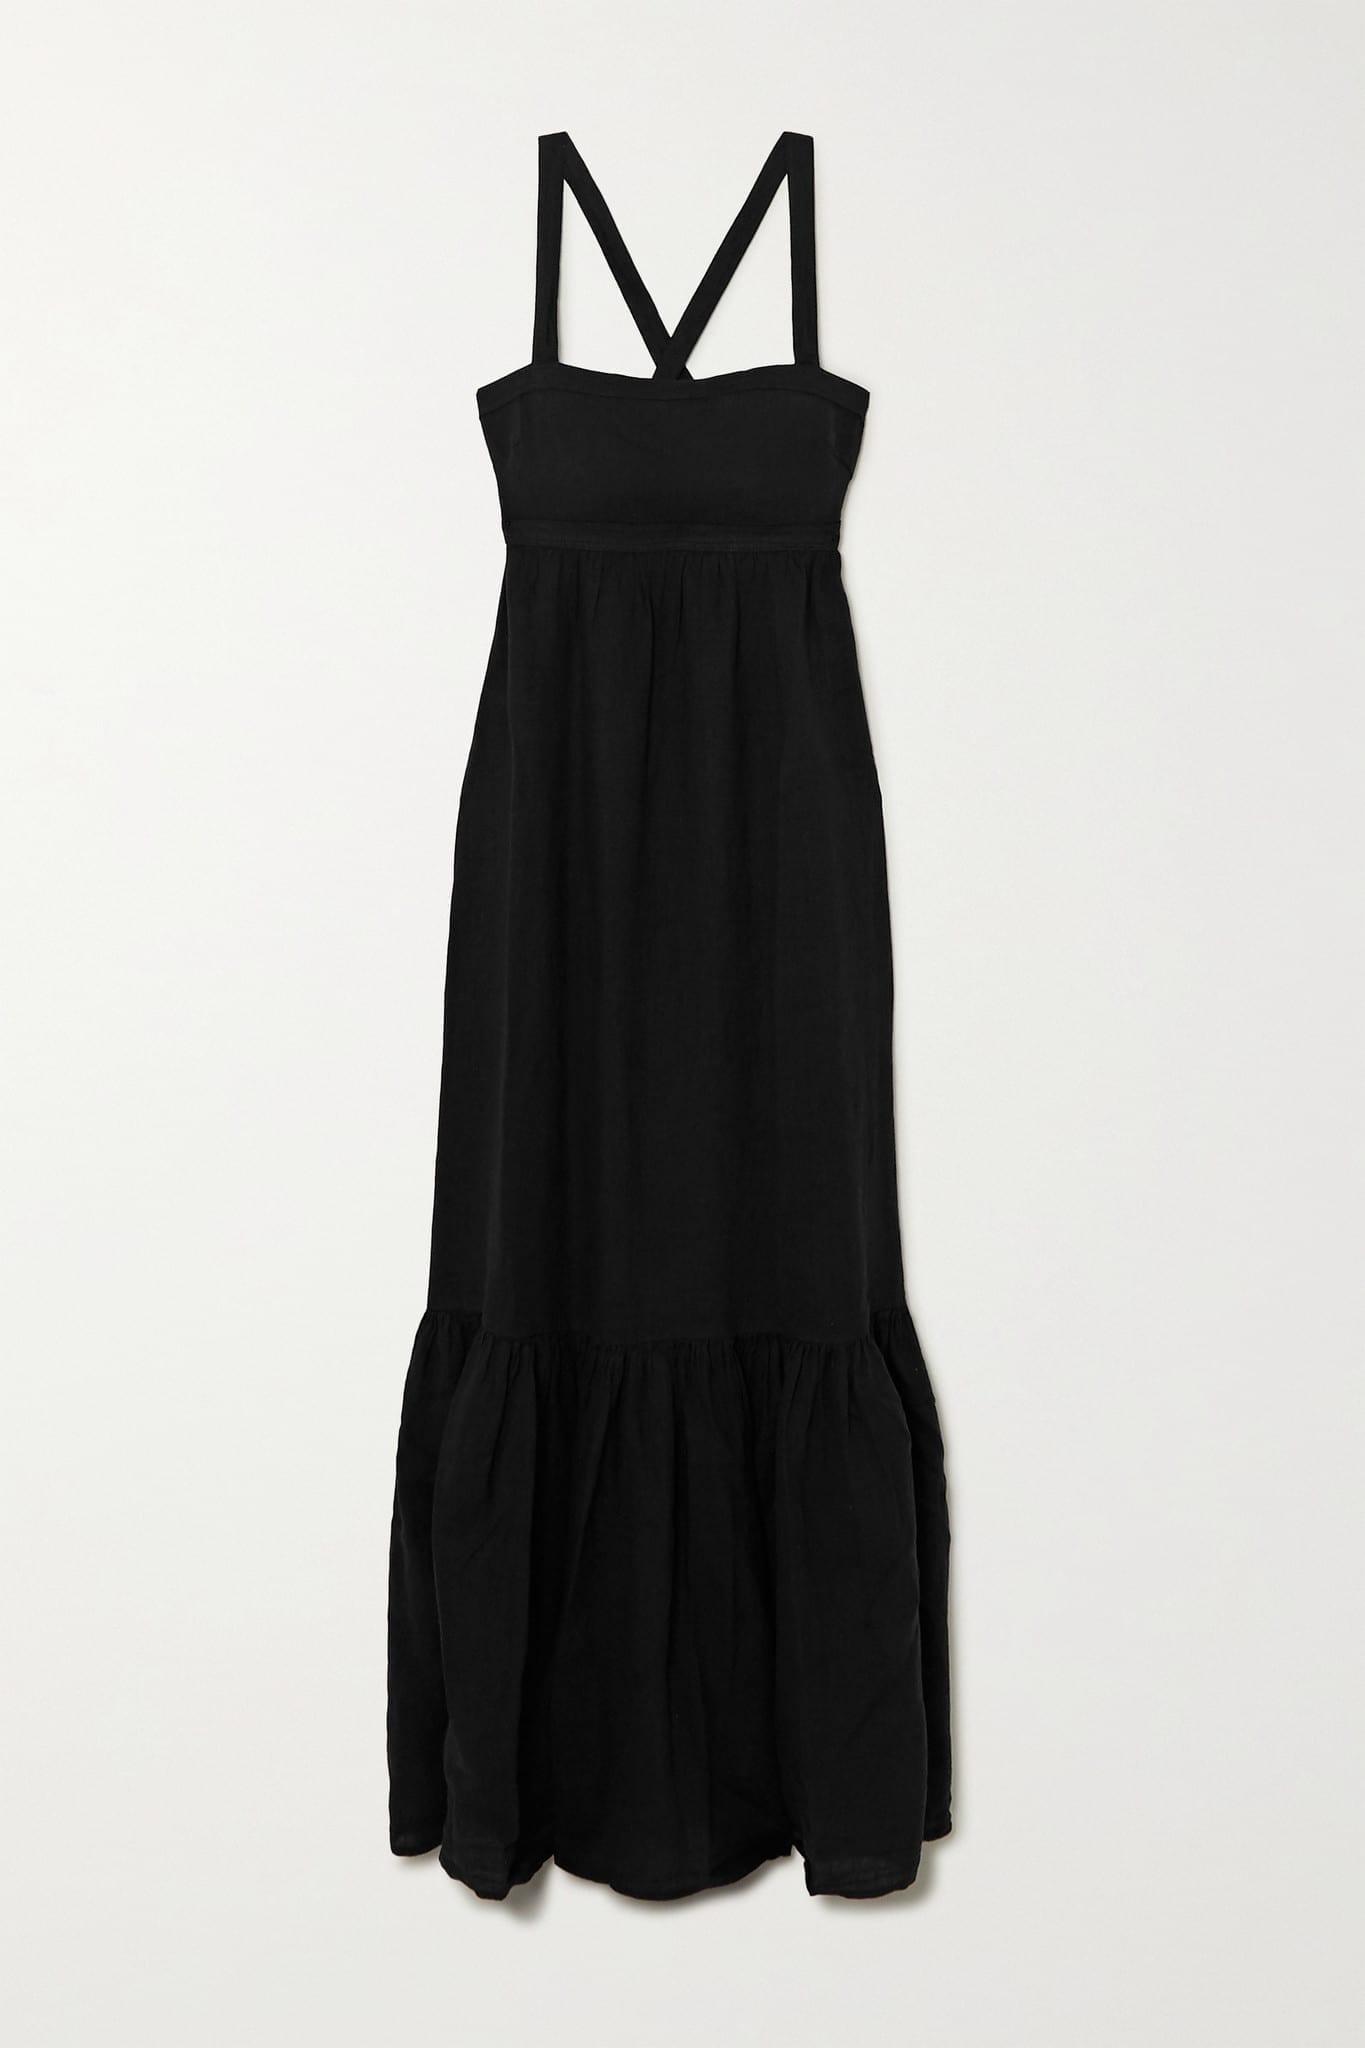 HONORINE Athena Tiered Maxi Dress